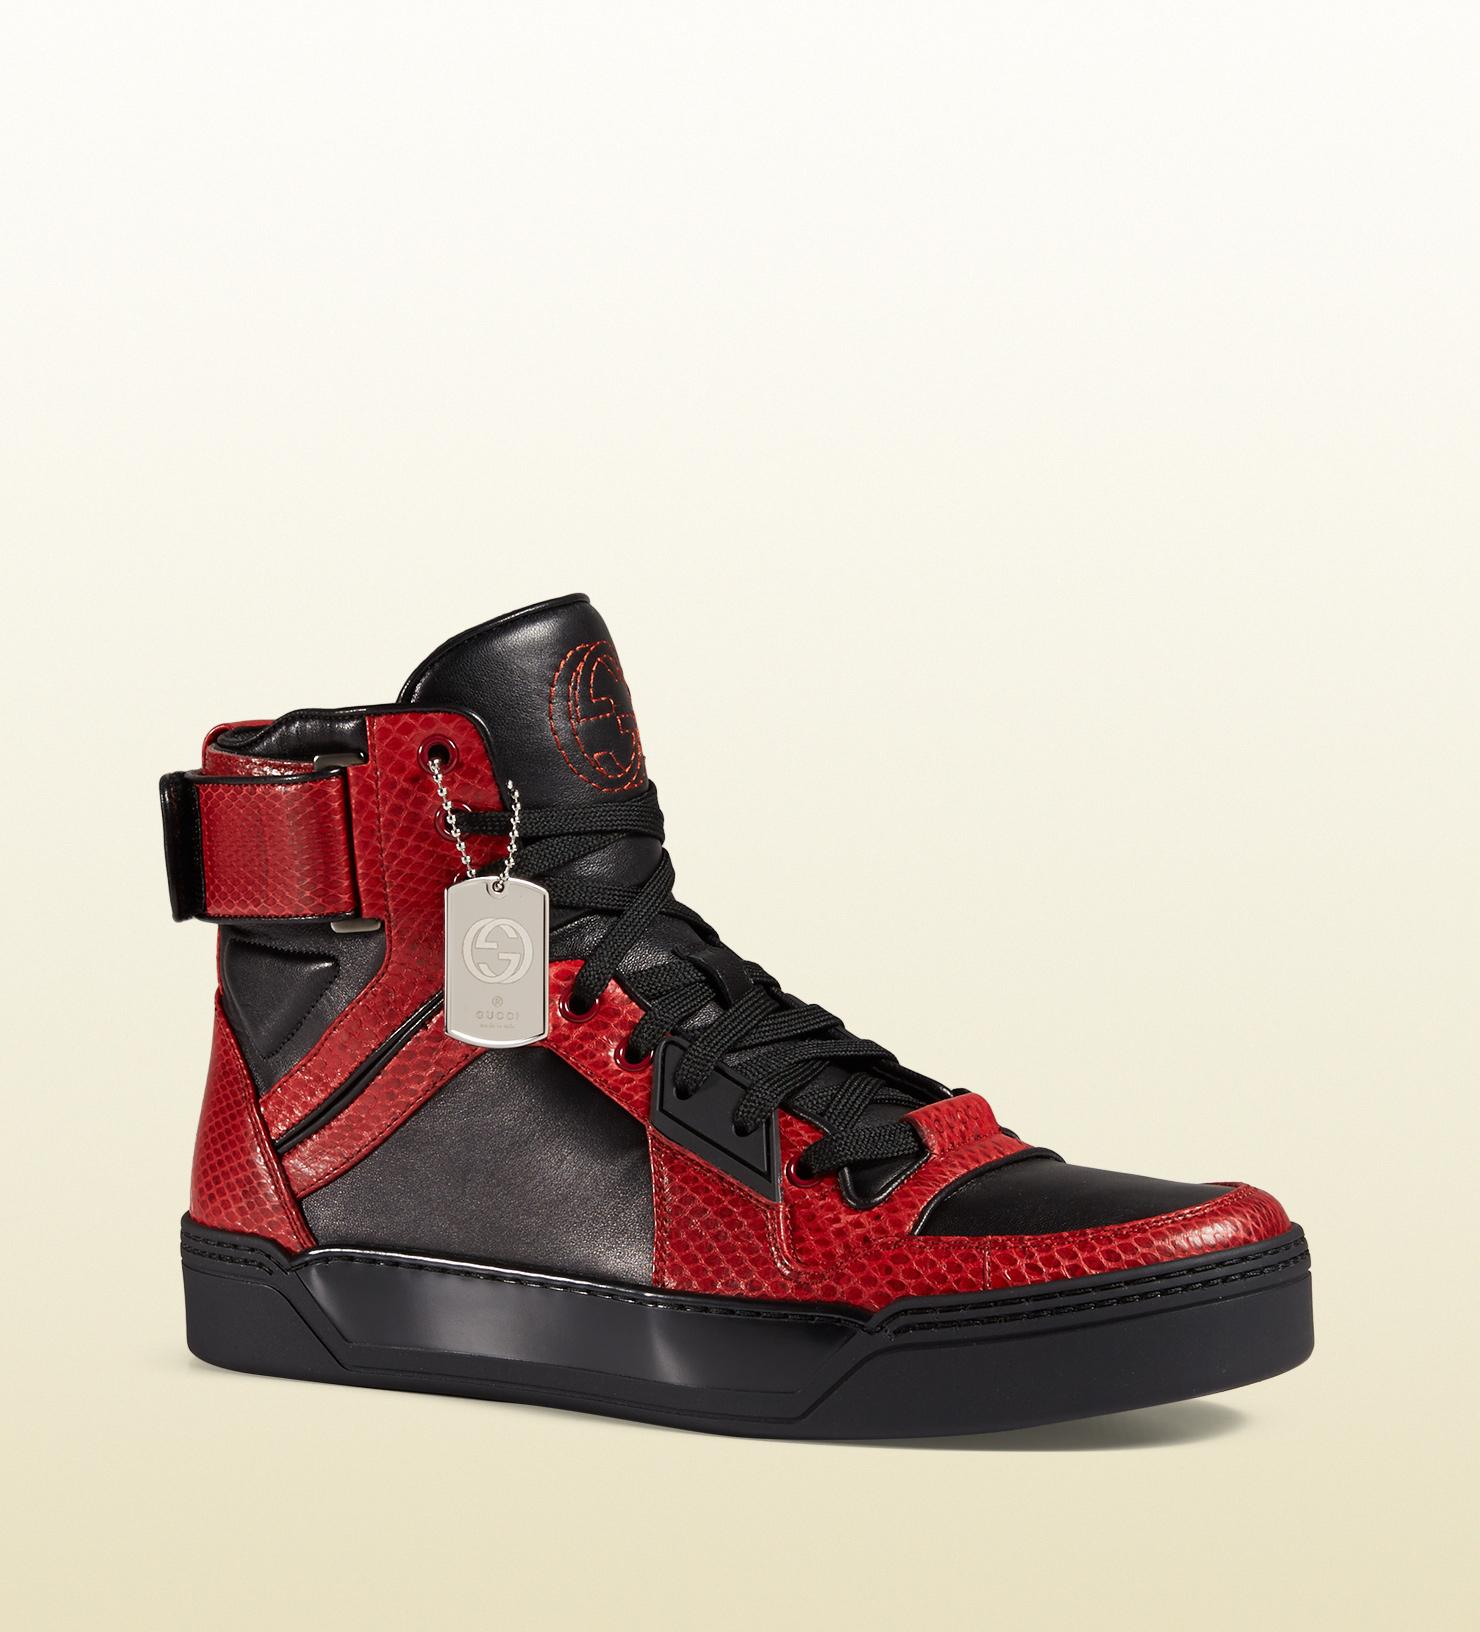 Fendi Shoes Uk Online